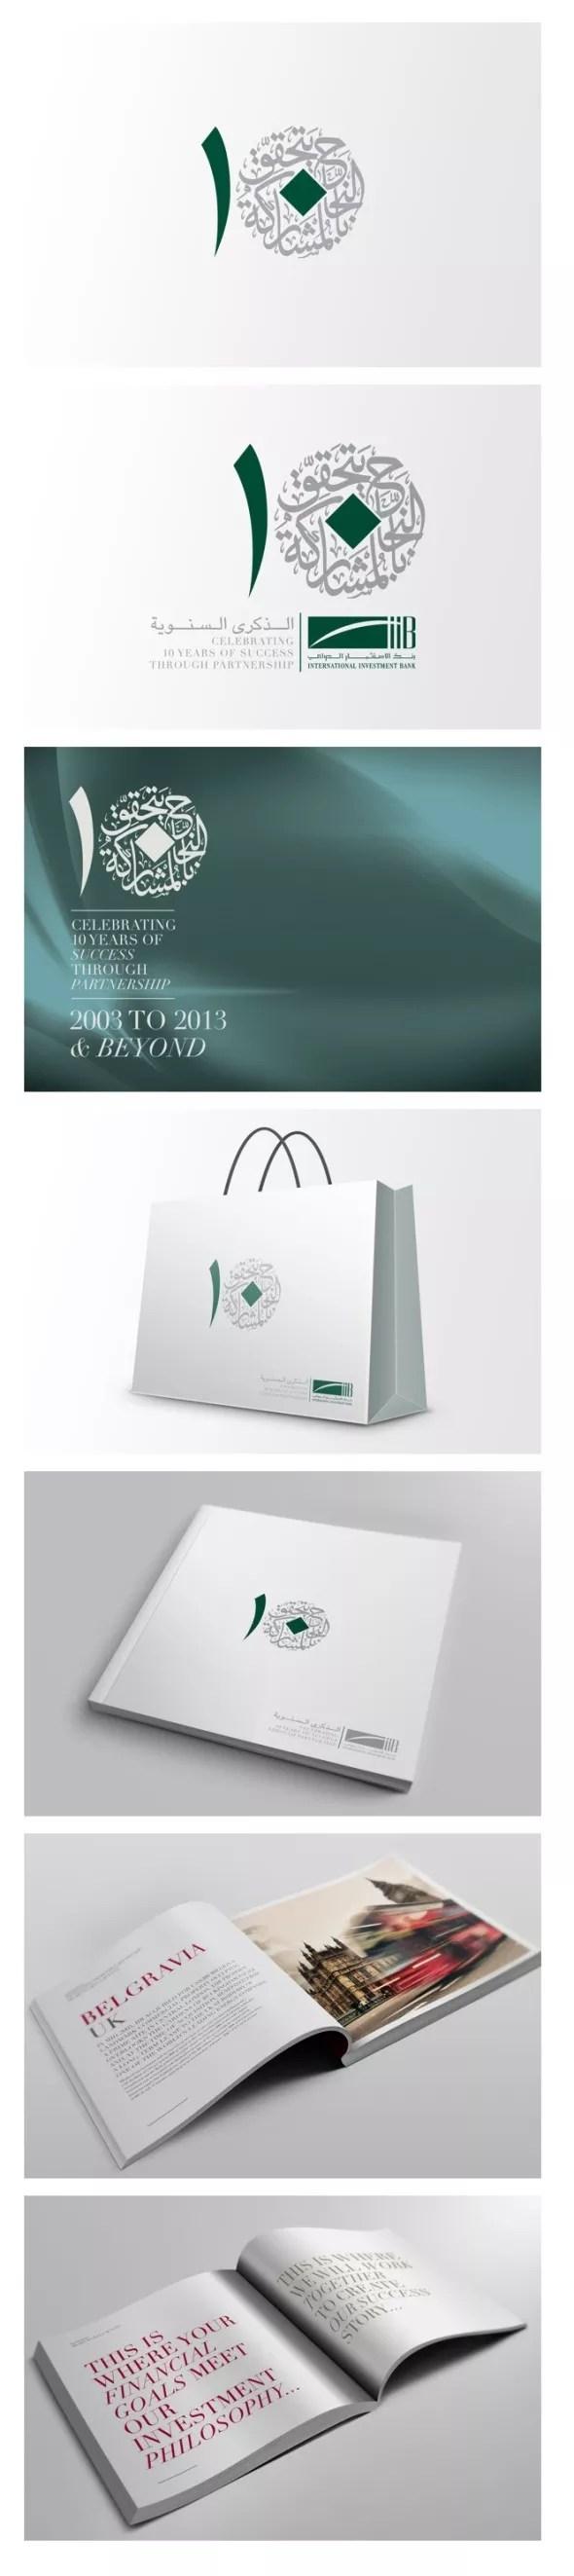 IIB 10th Anniversary Arabic Branding